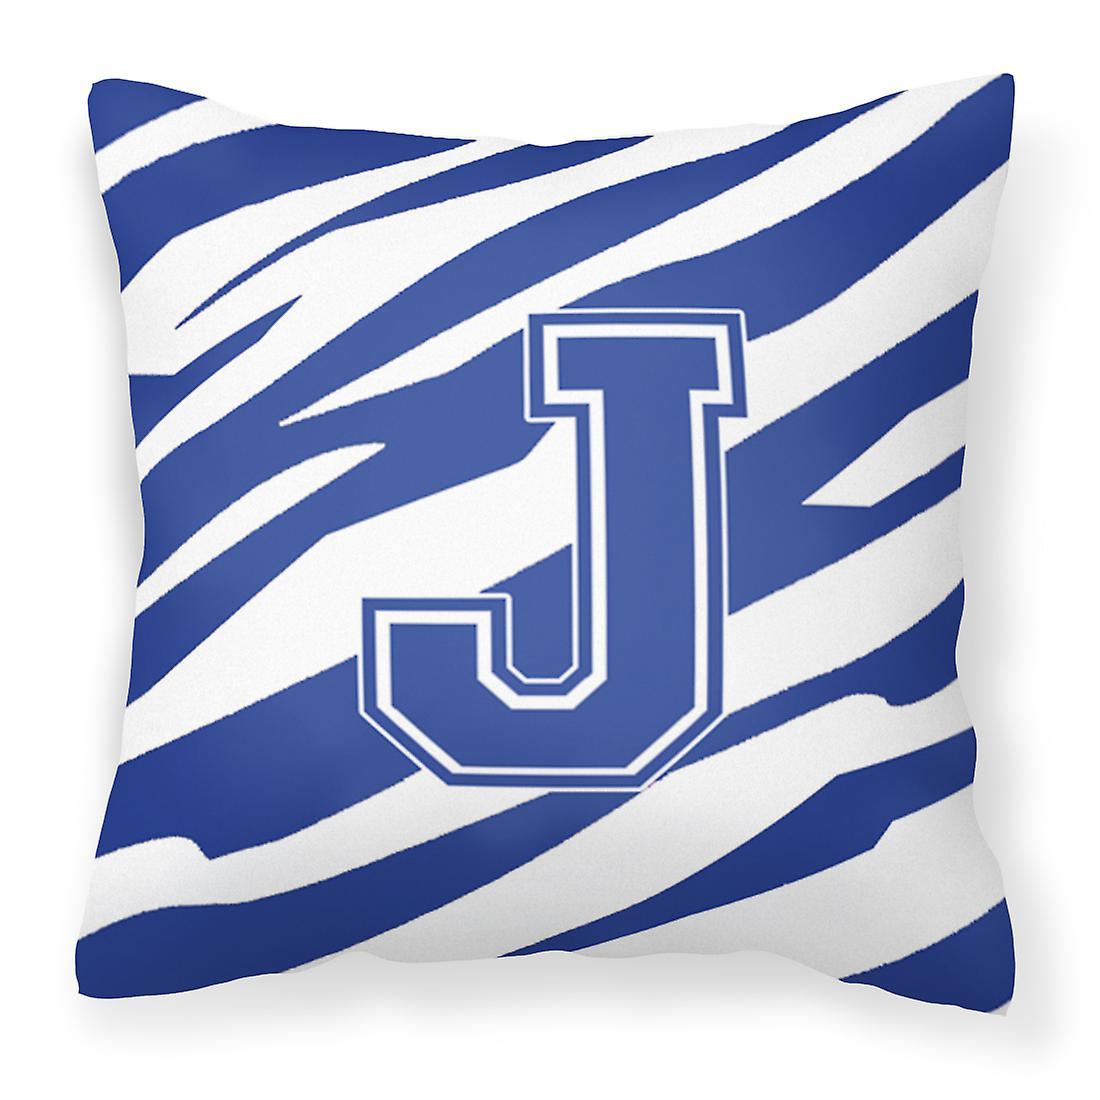 Et Décoratif Monogramme Bleu De J Blanc Tiger Tissu Toile Oreiller Stripe Initiale CBodxWer